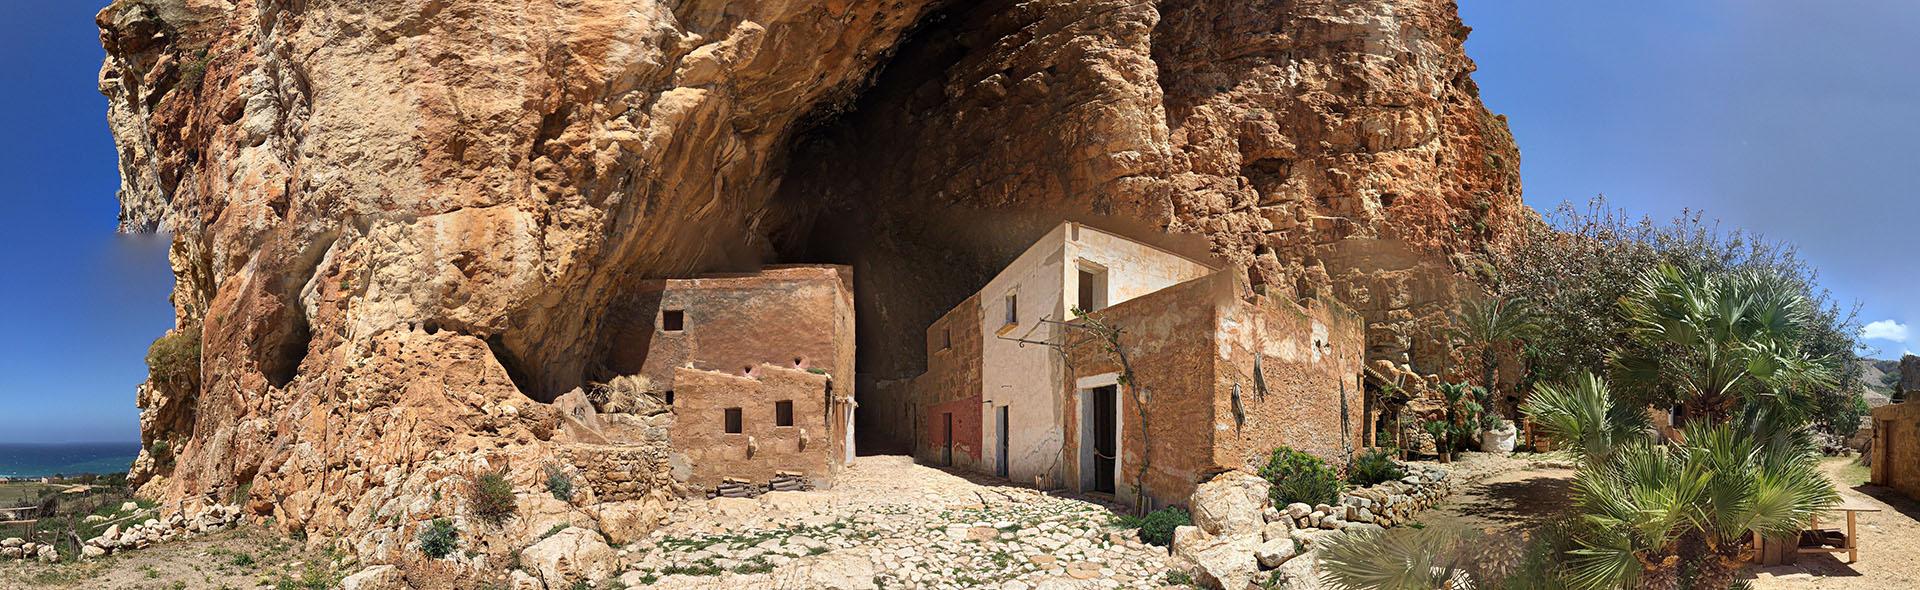 Grotte von Mangiapane